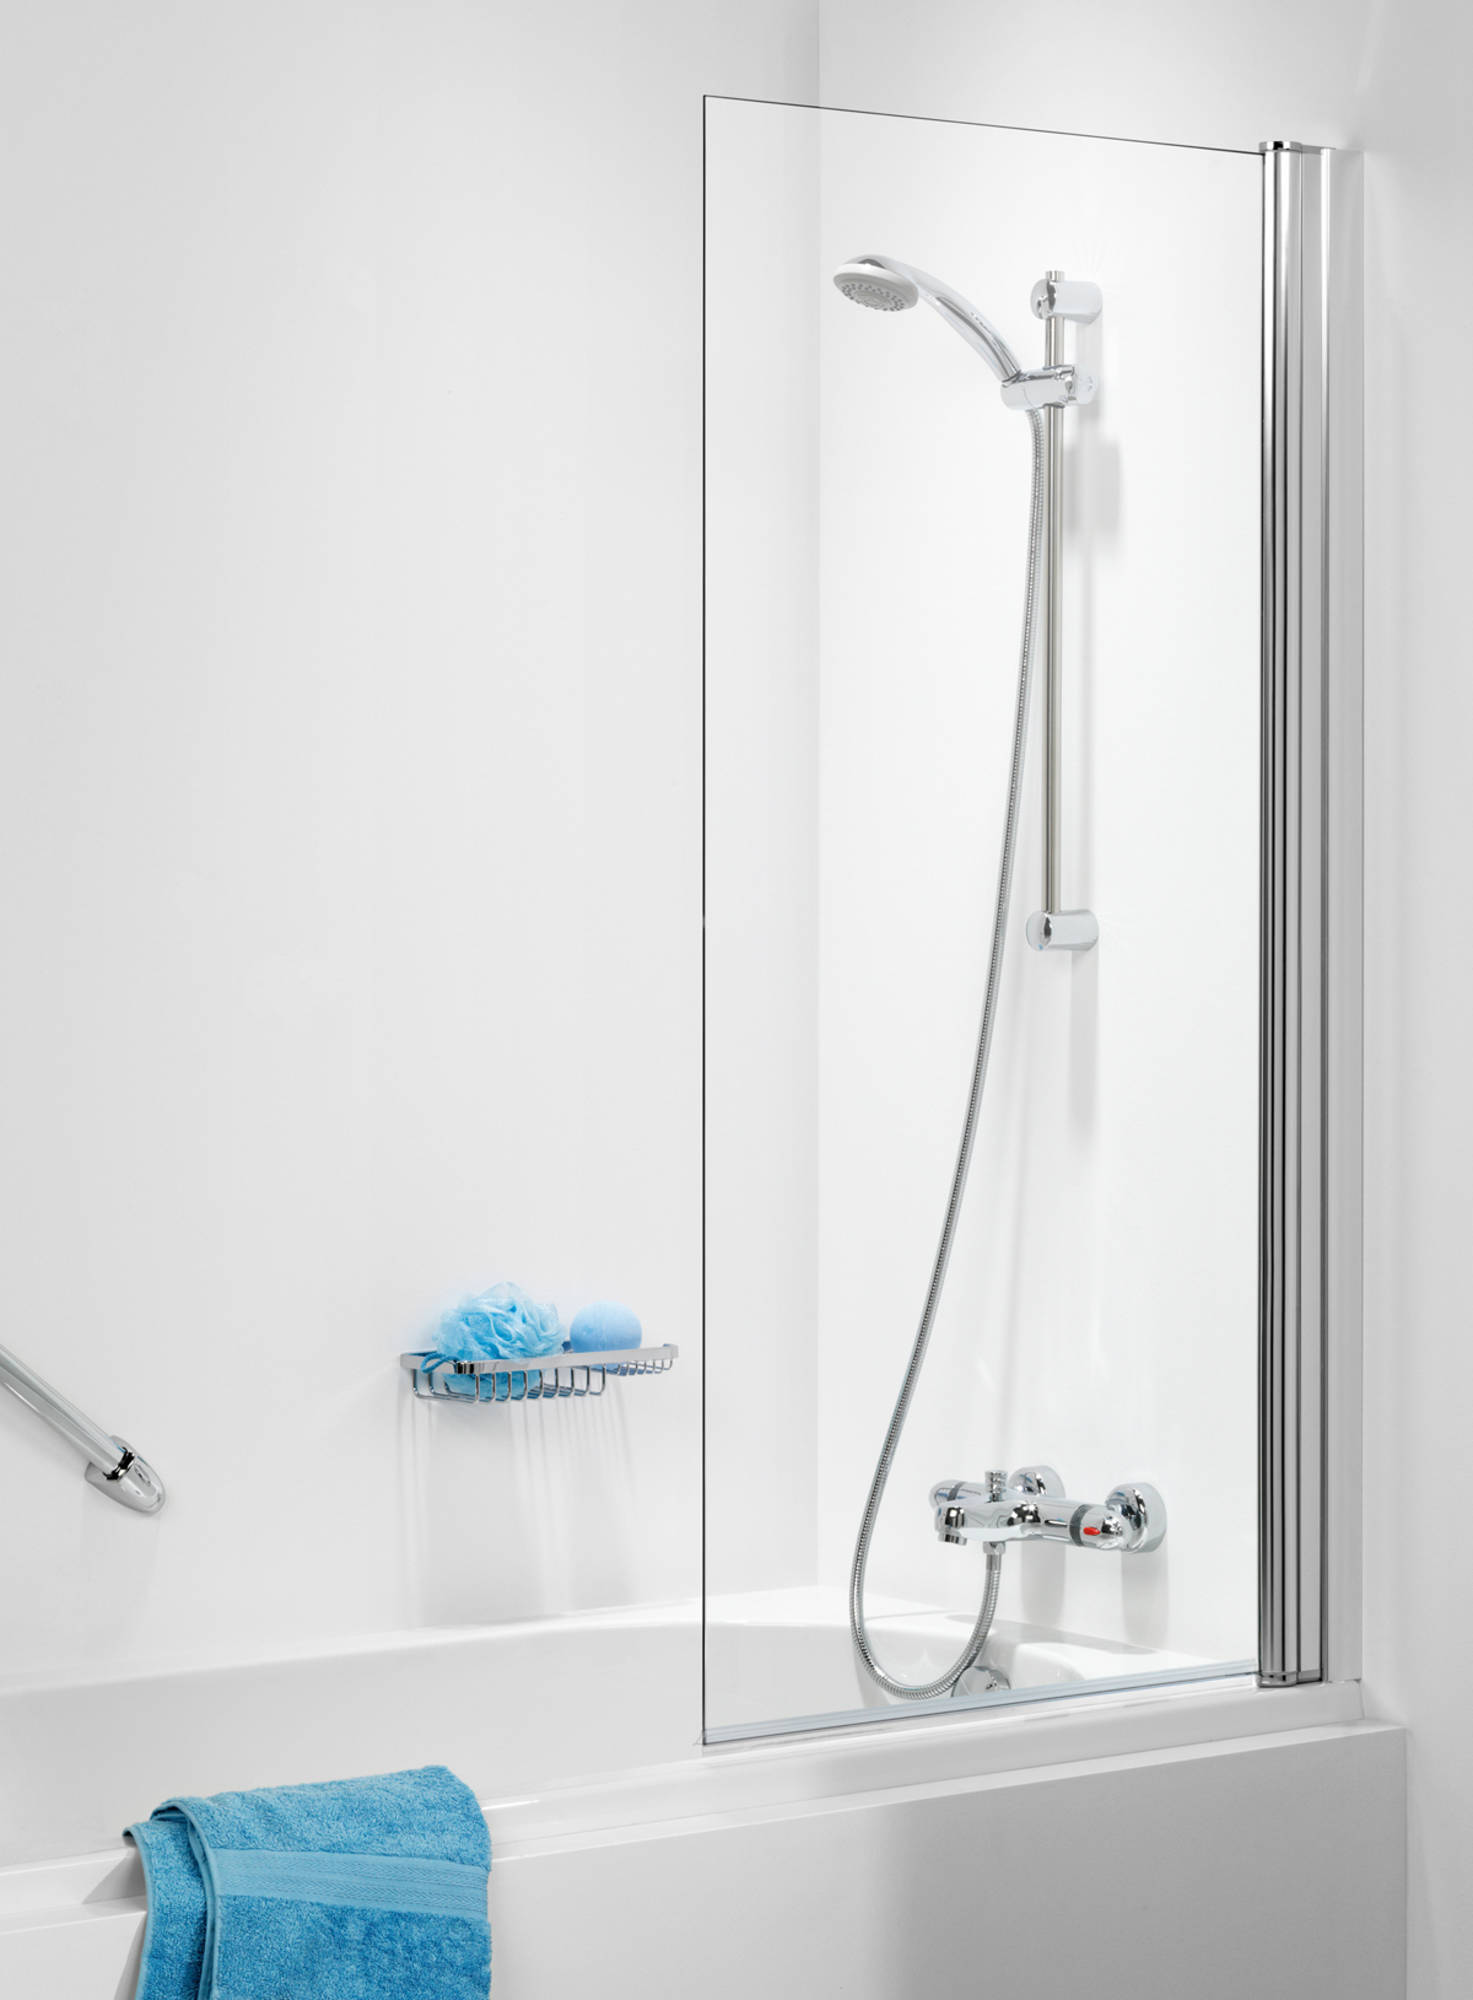 Get Wet 105 SH-BW70 Badwand met 6mm helder veiligheidsglas